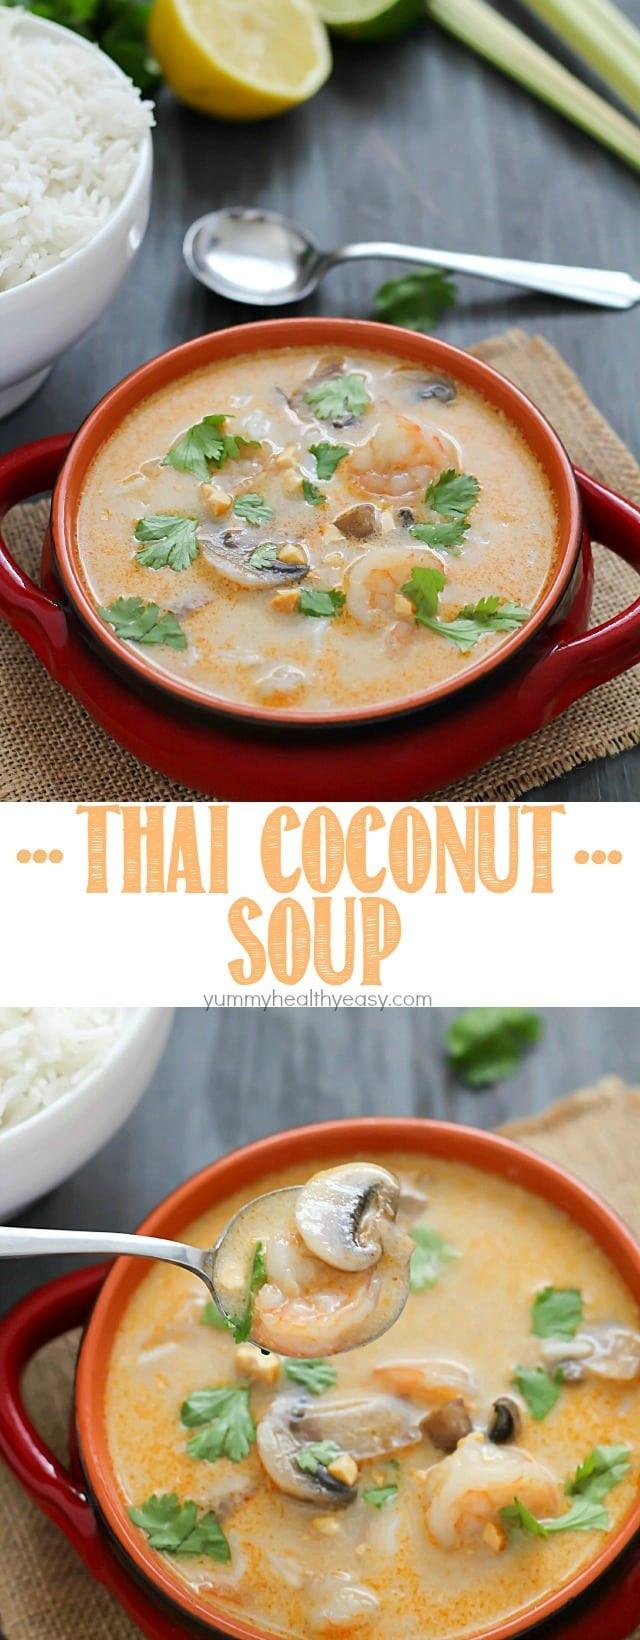 Thai Coconut Soup Recipes  Thai Coconut Soup Yummy Healthy Easy